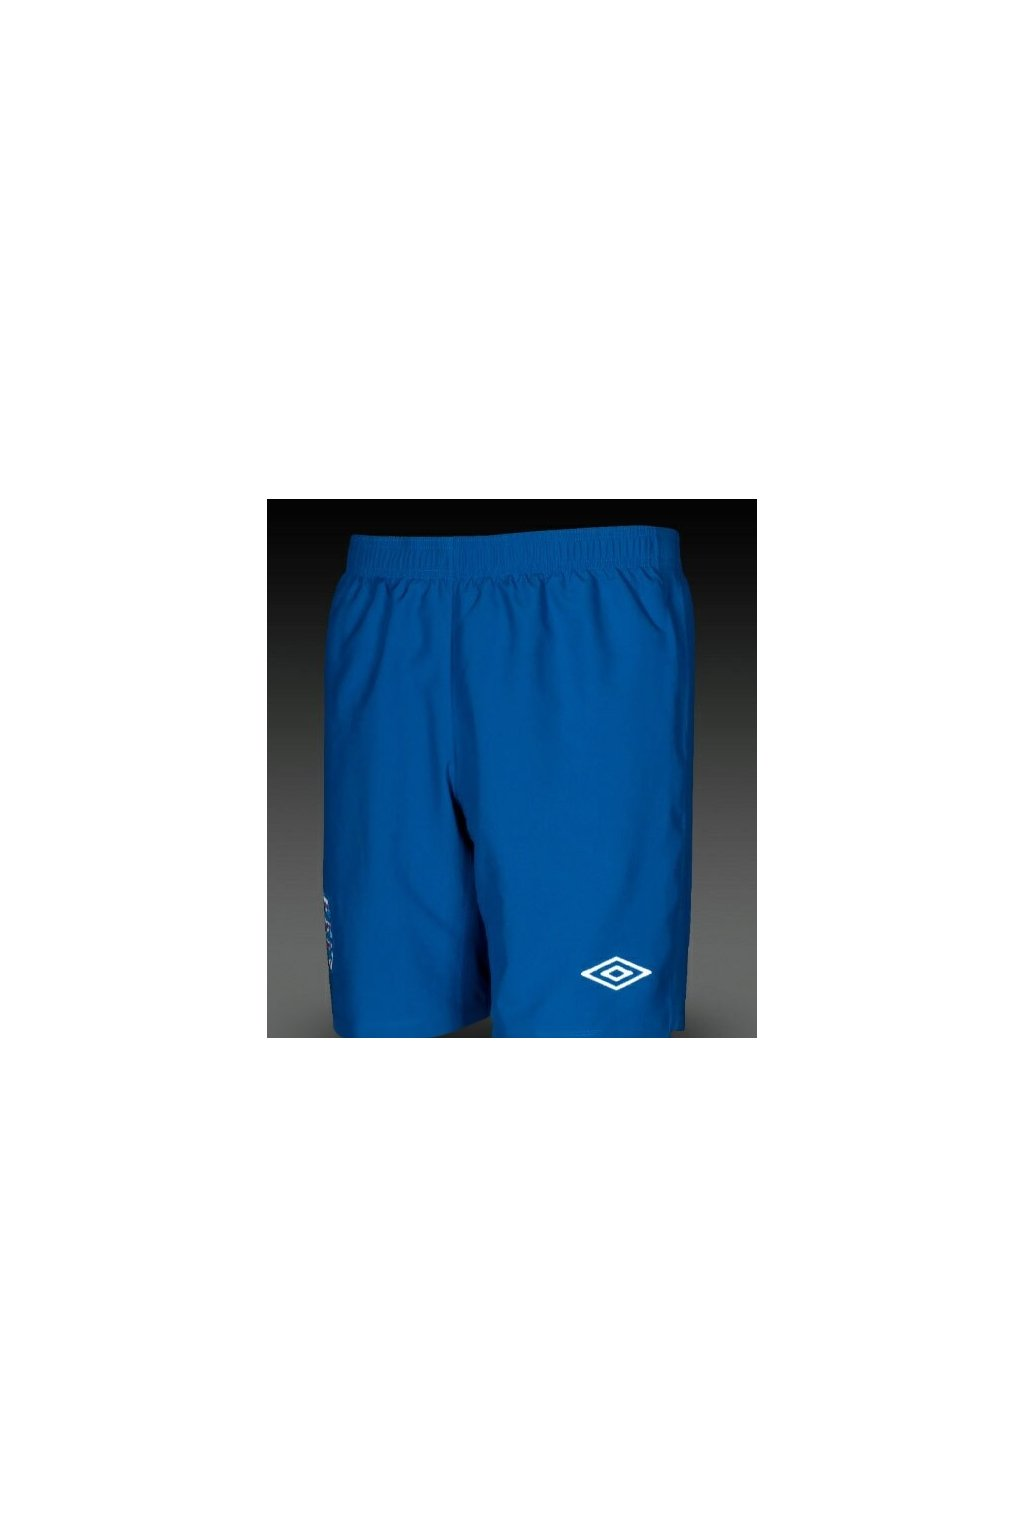 Umbro England chlapčenské kraťasy 71616U-SHV  modré